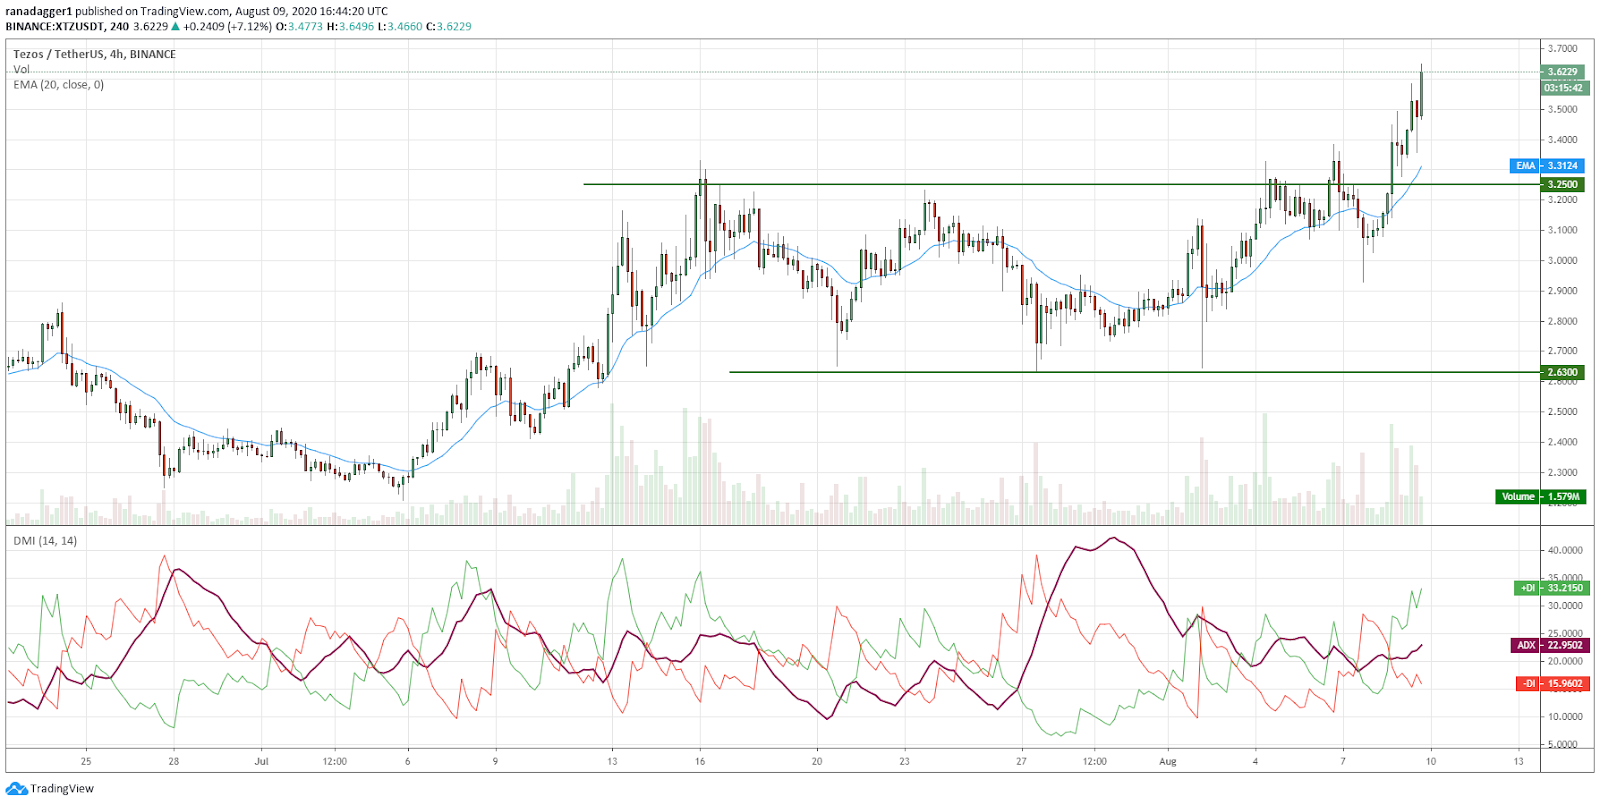 XTZ/USD 4-hour chart